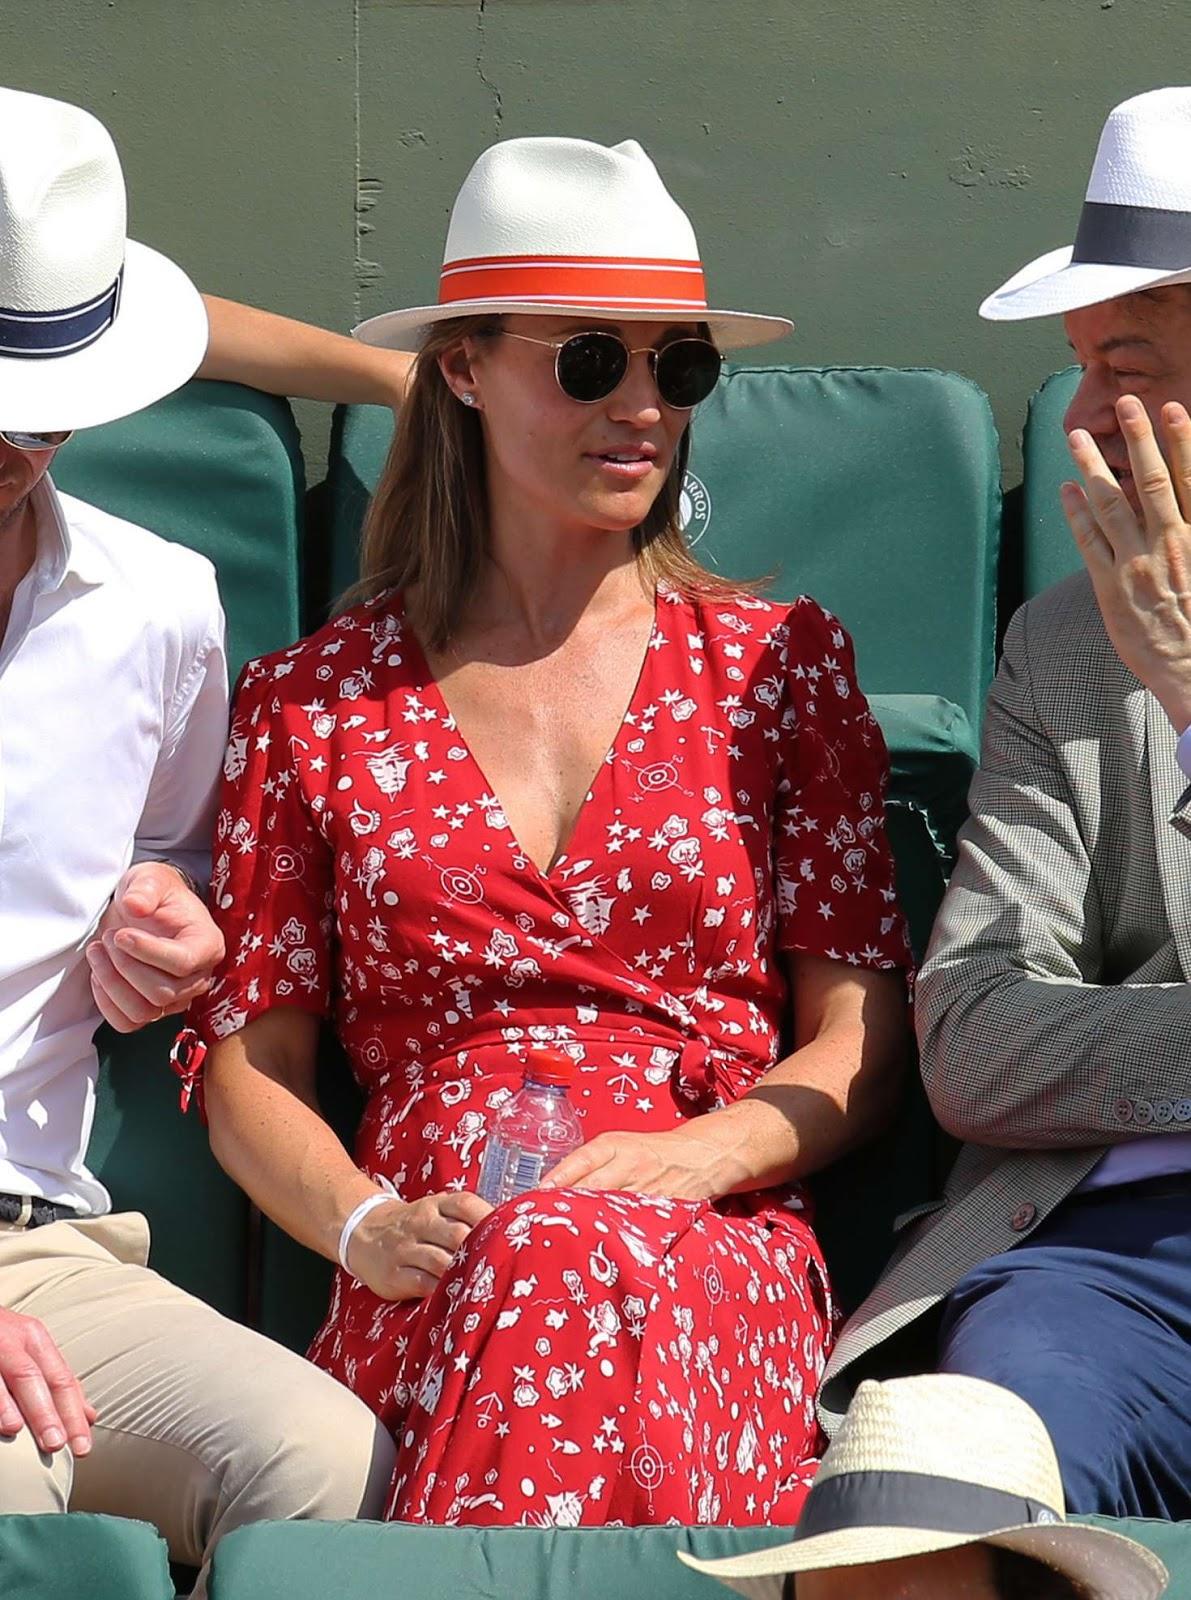 Pippa Middleton at Roland Garros 2018 in Paris